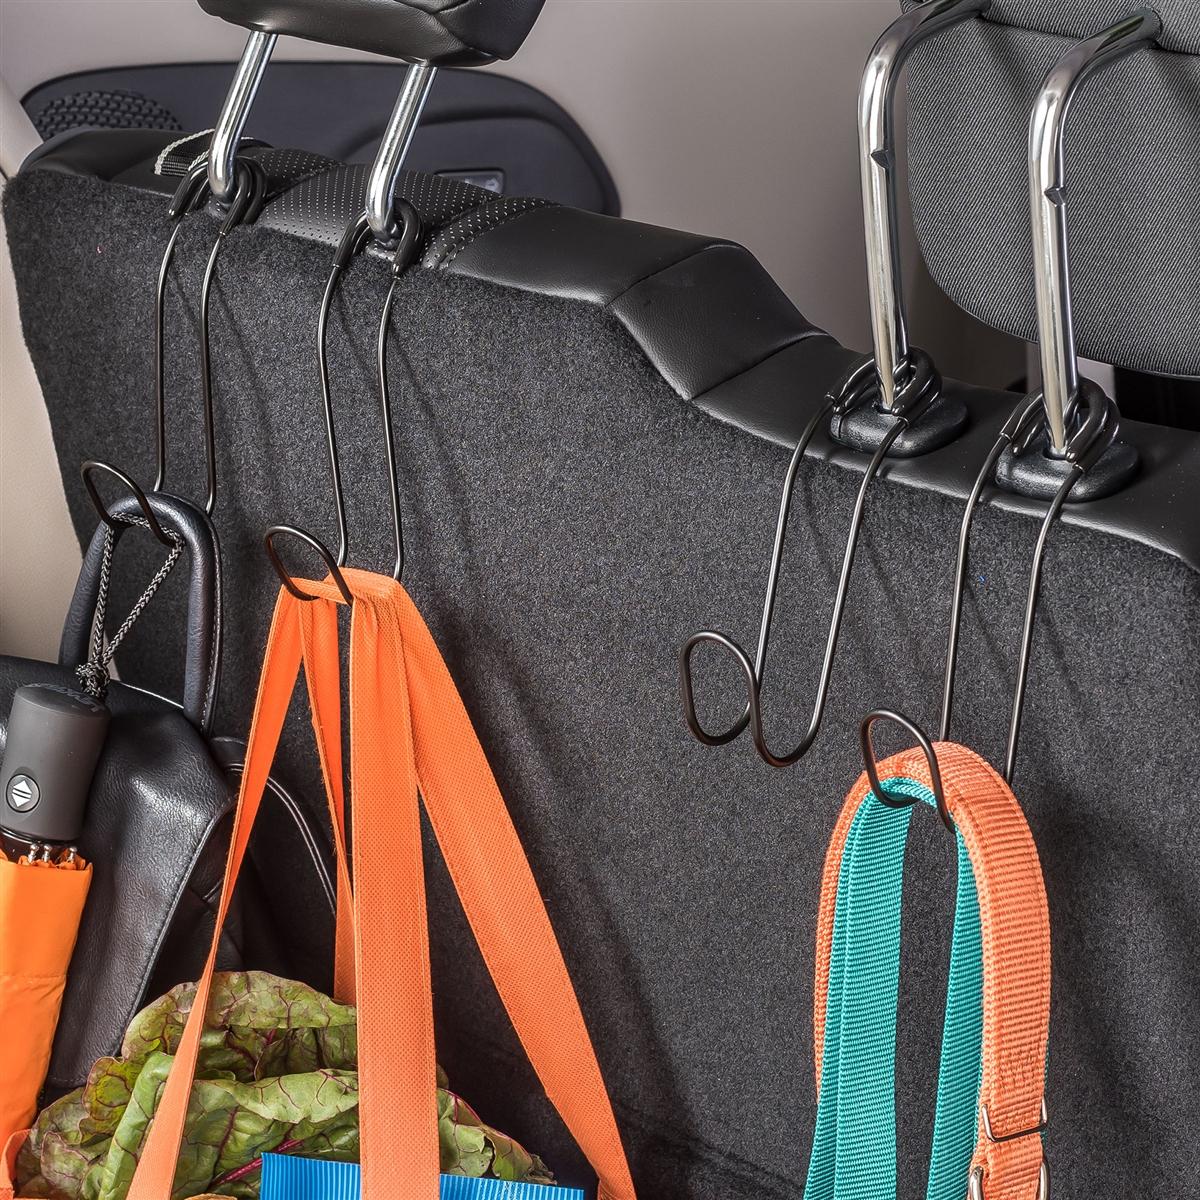 Set Of 2 Black Car Headrest Hooks Add Instant Storage To The Seat